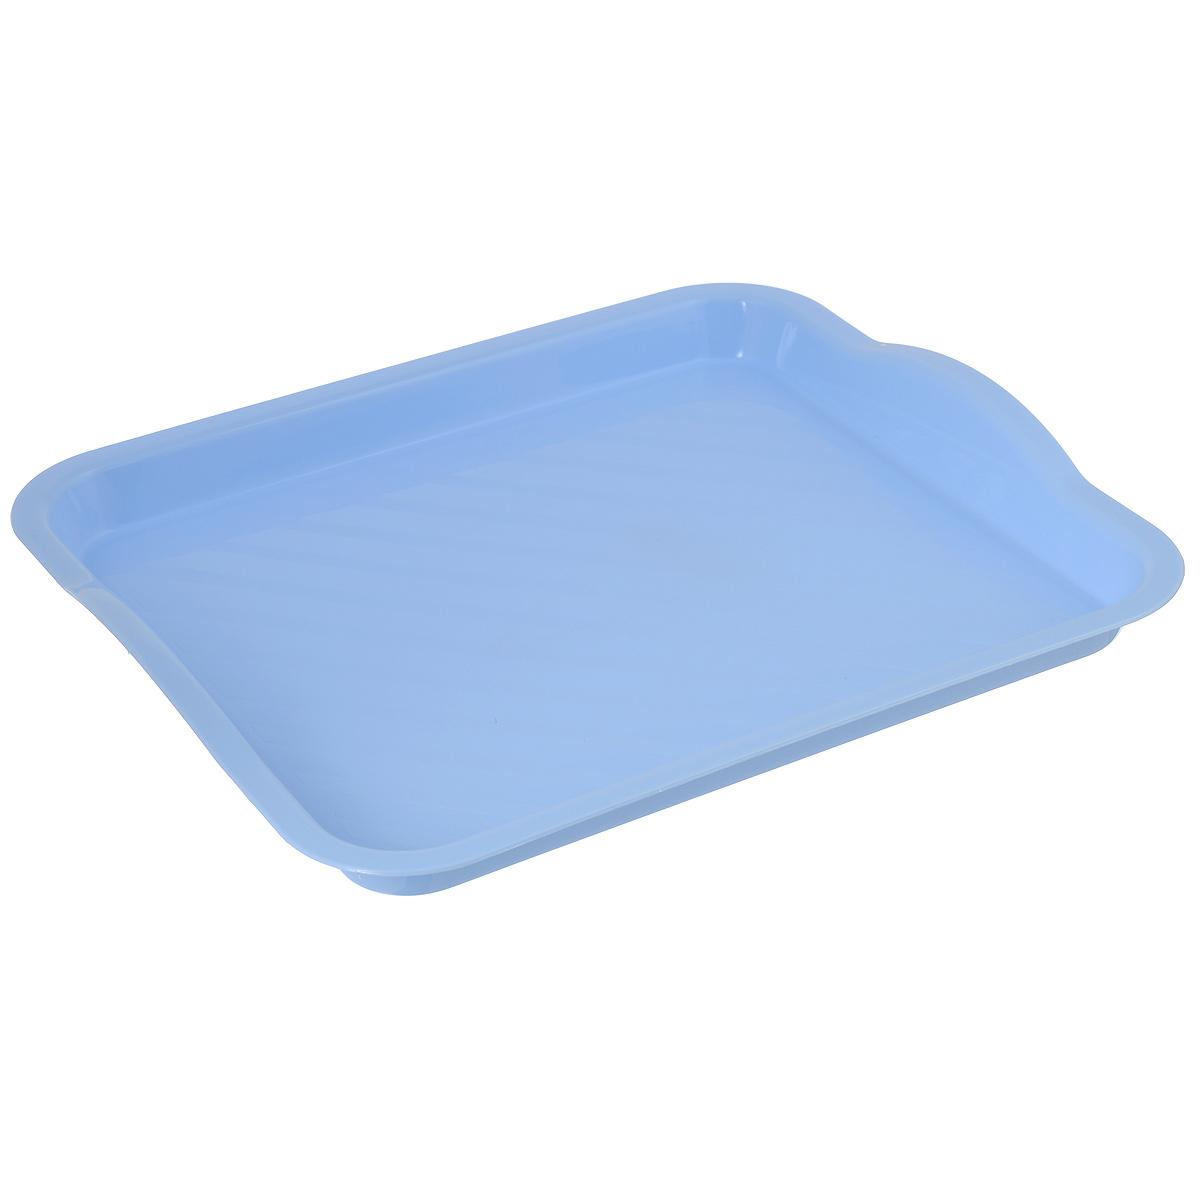 "Поднос ""Idea"", цвет: голубой, 29 см х 25 см"